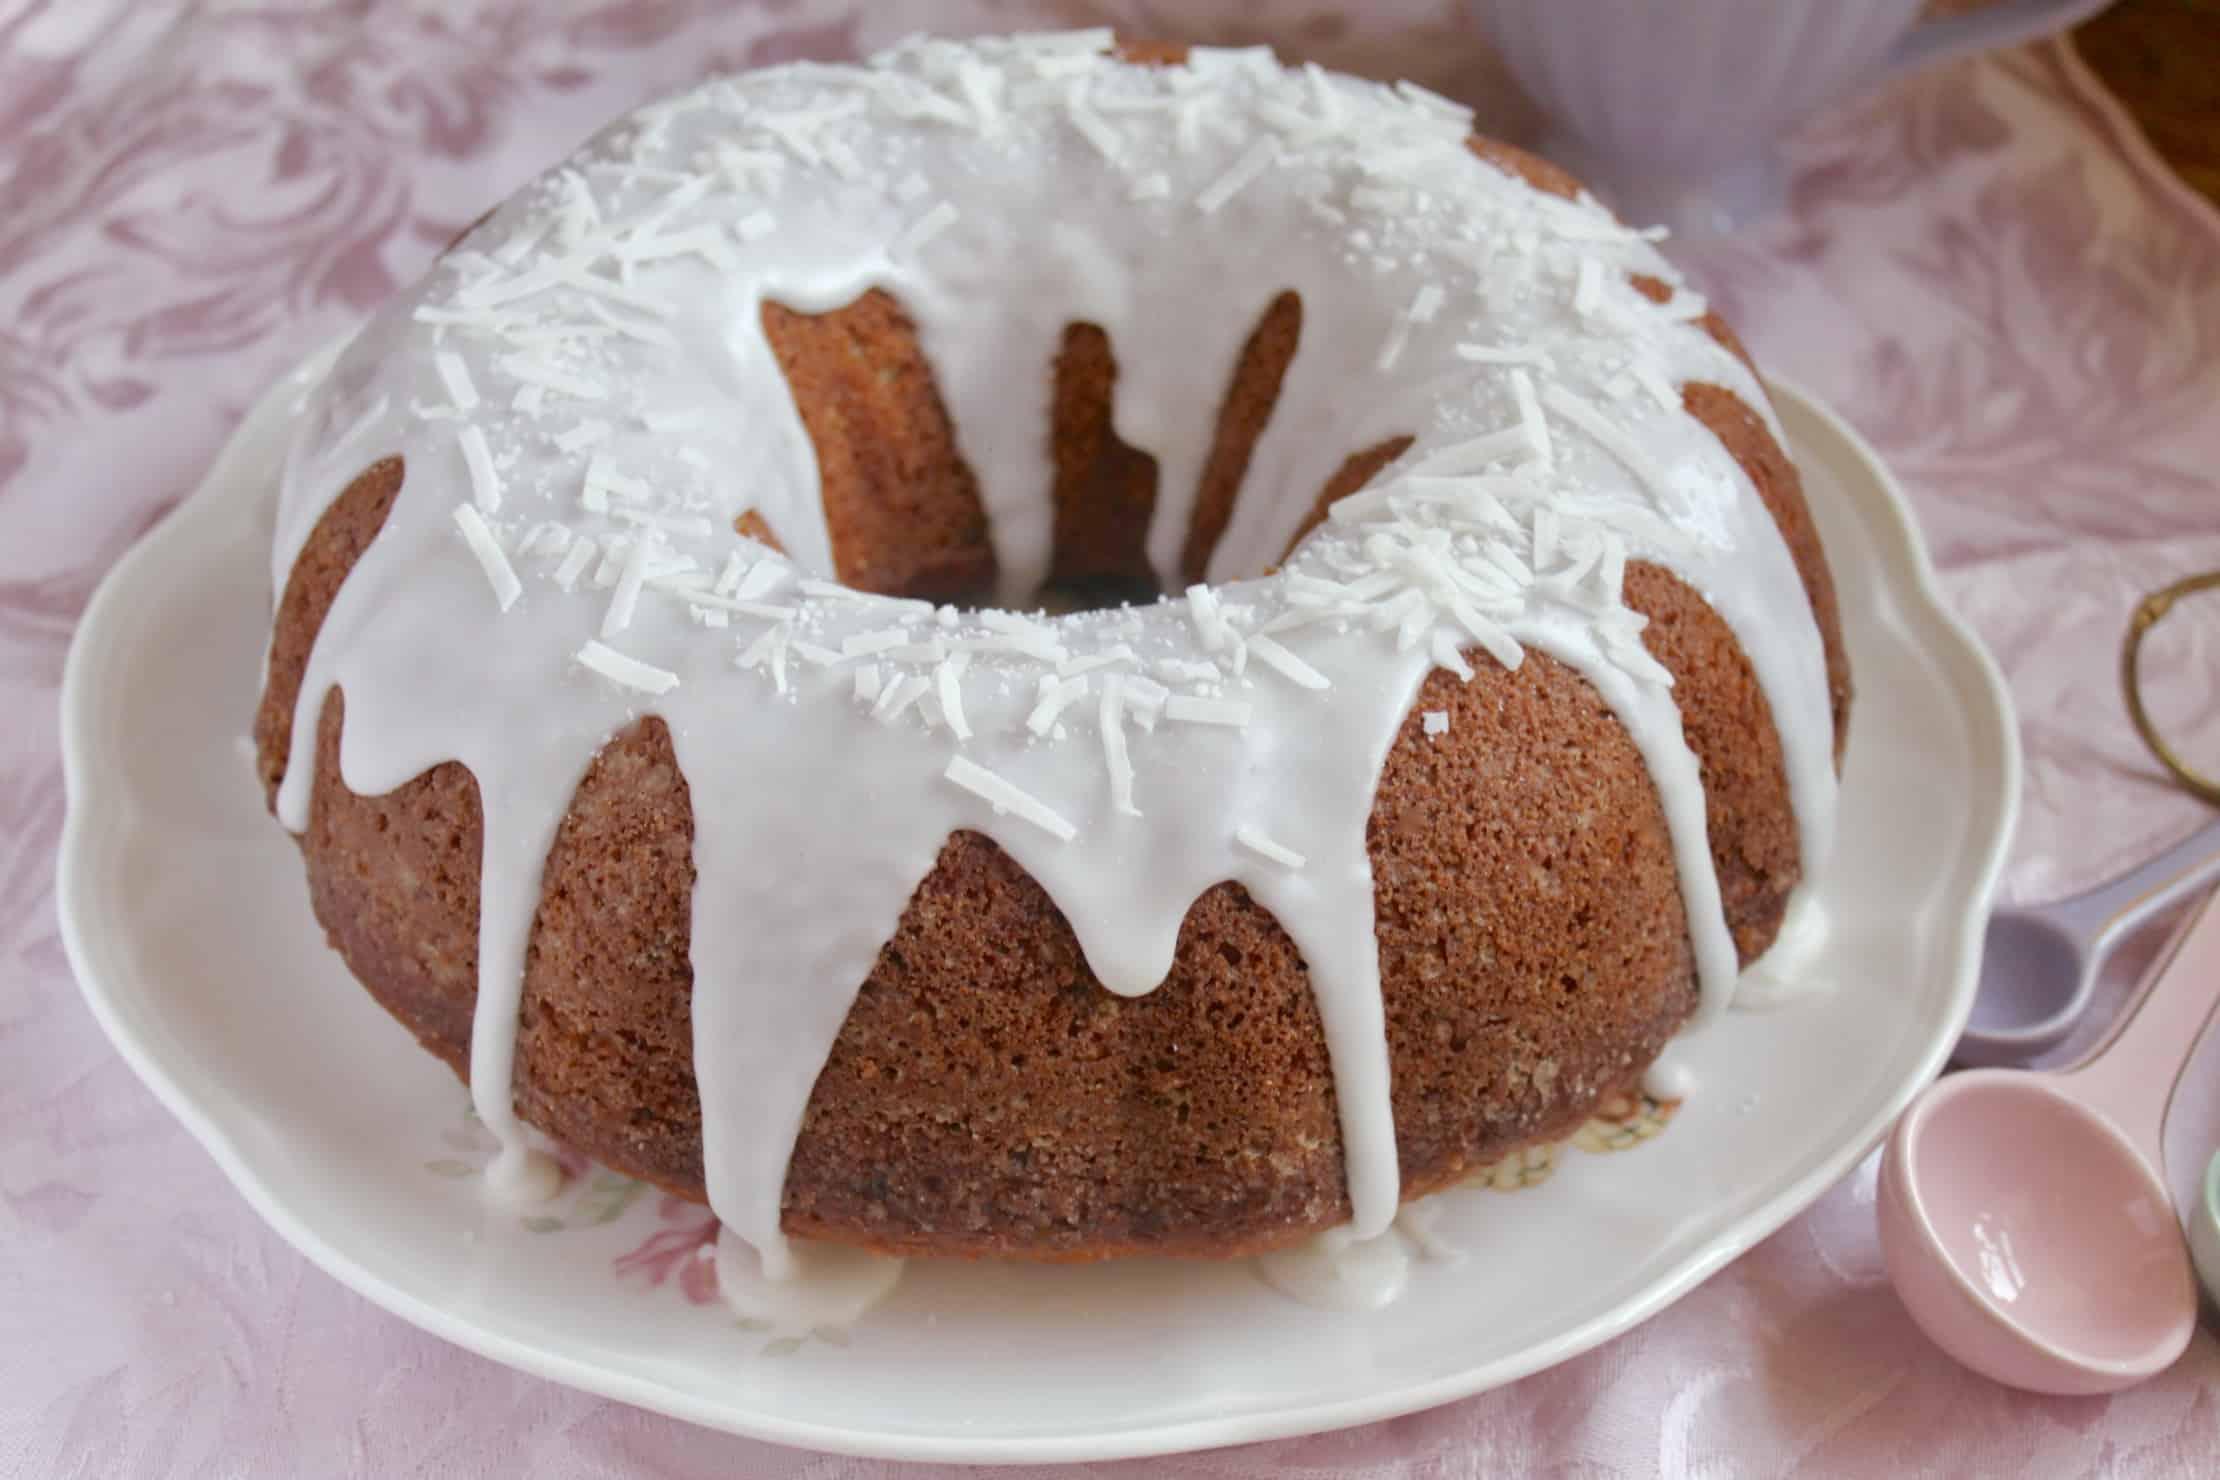 banana coconut bundt cake on plate